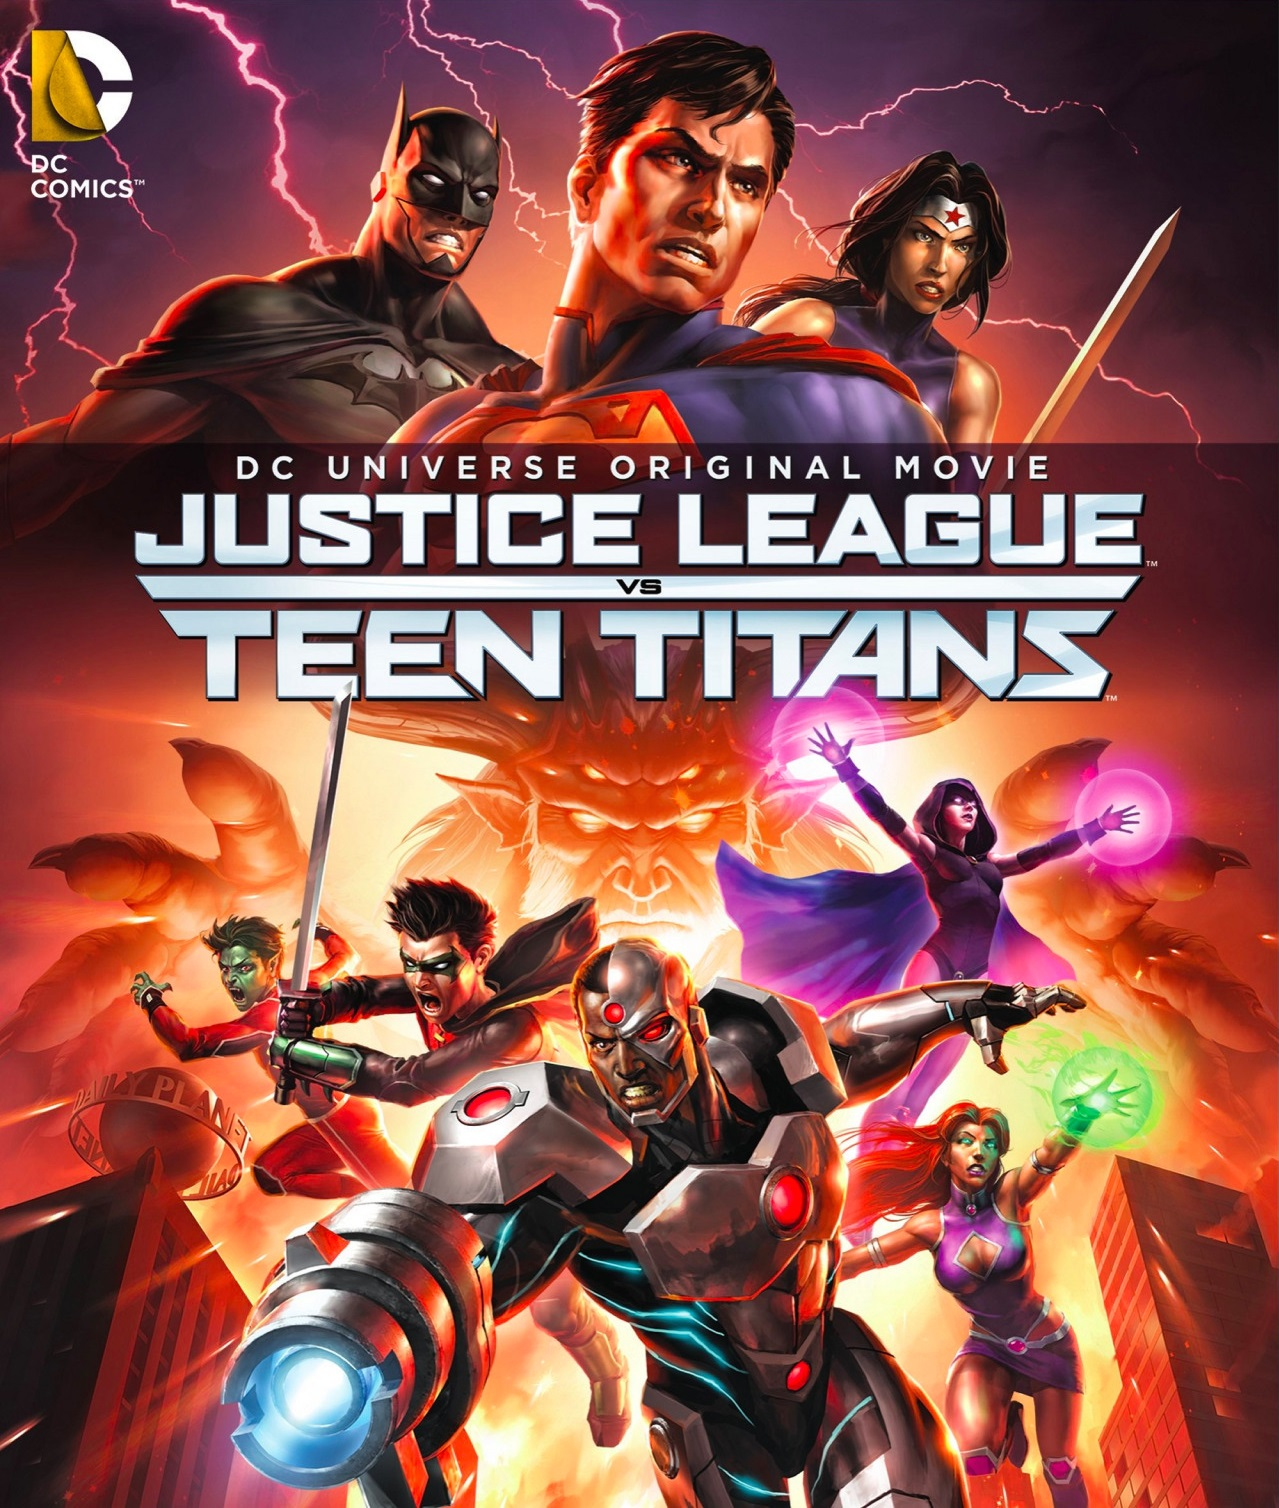 titans putlocker judas contract teen